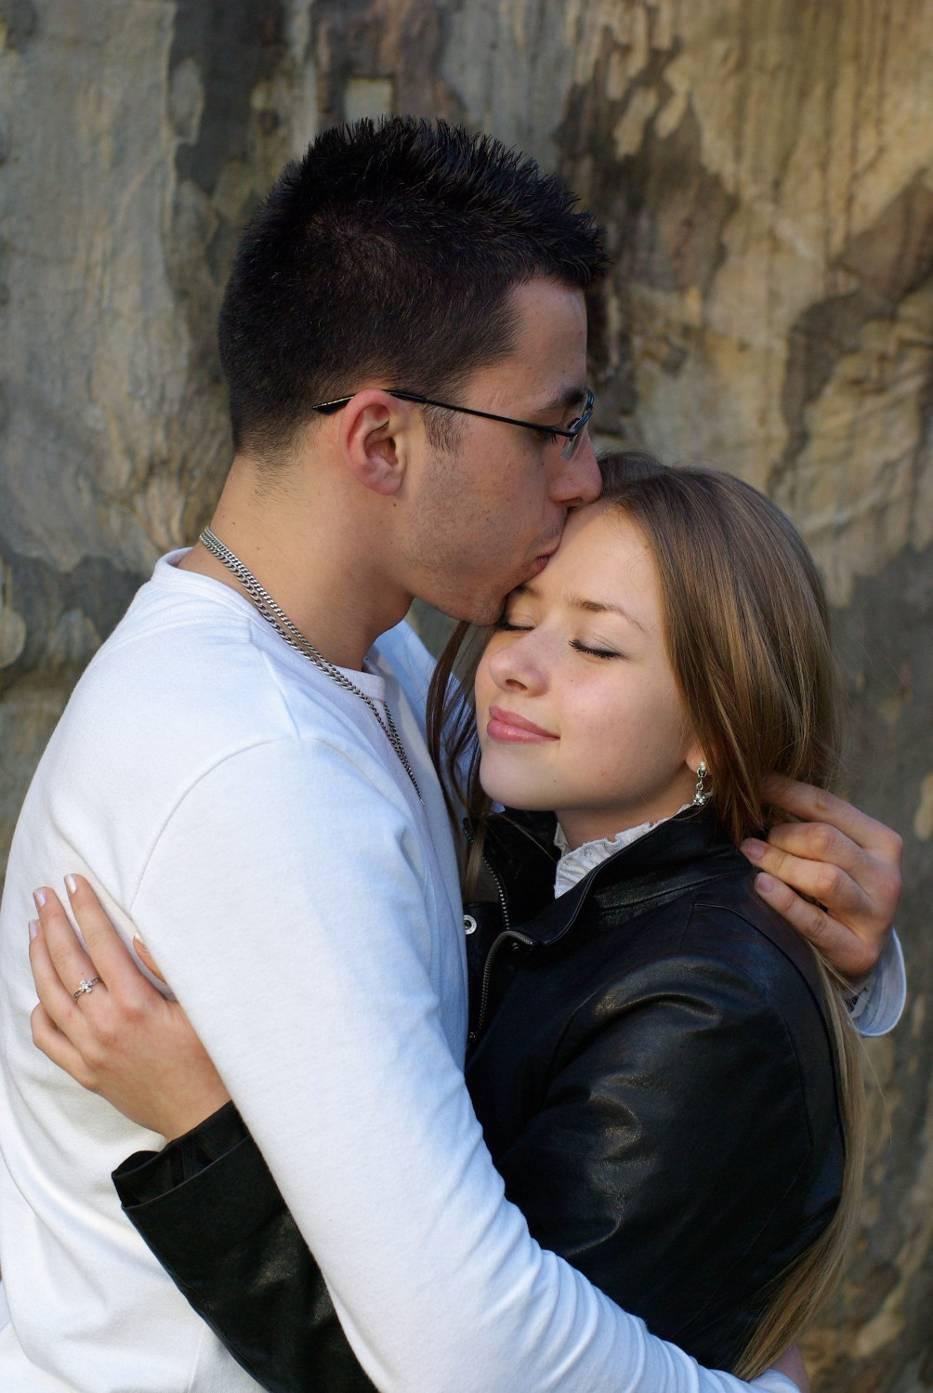 edarling portal randkowy Sosnowiec